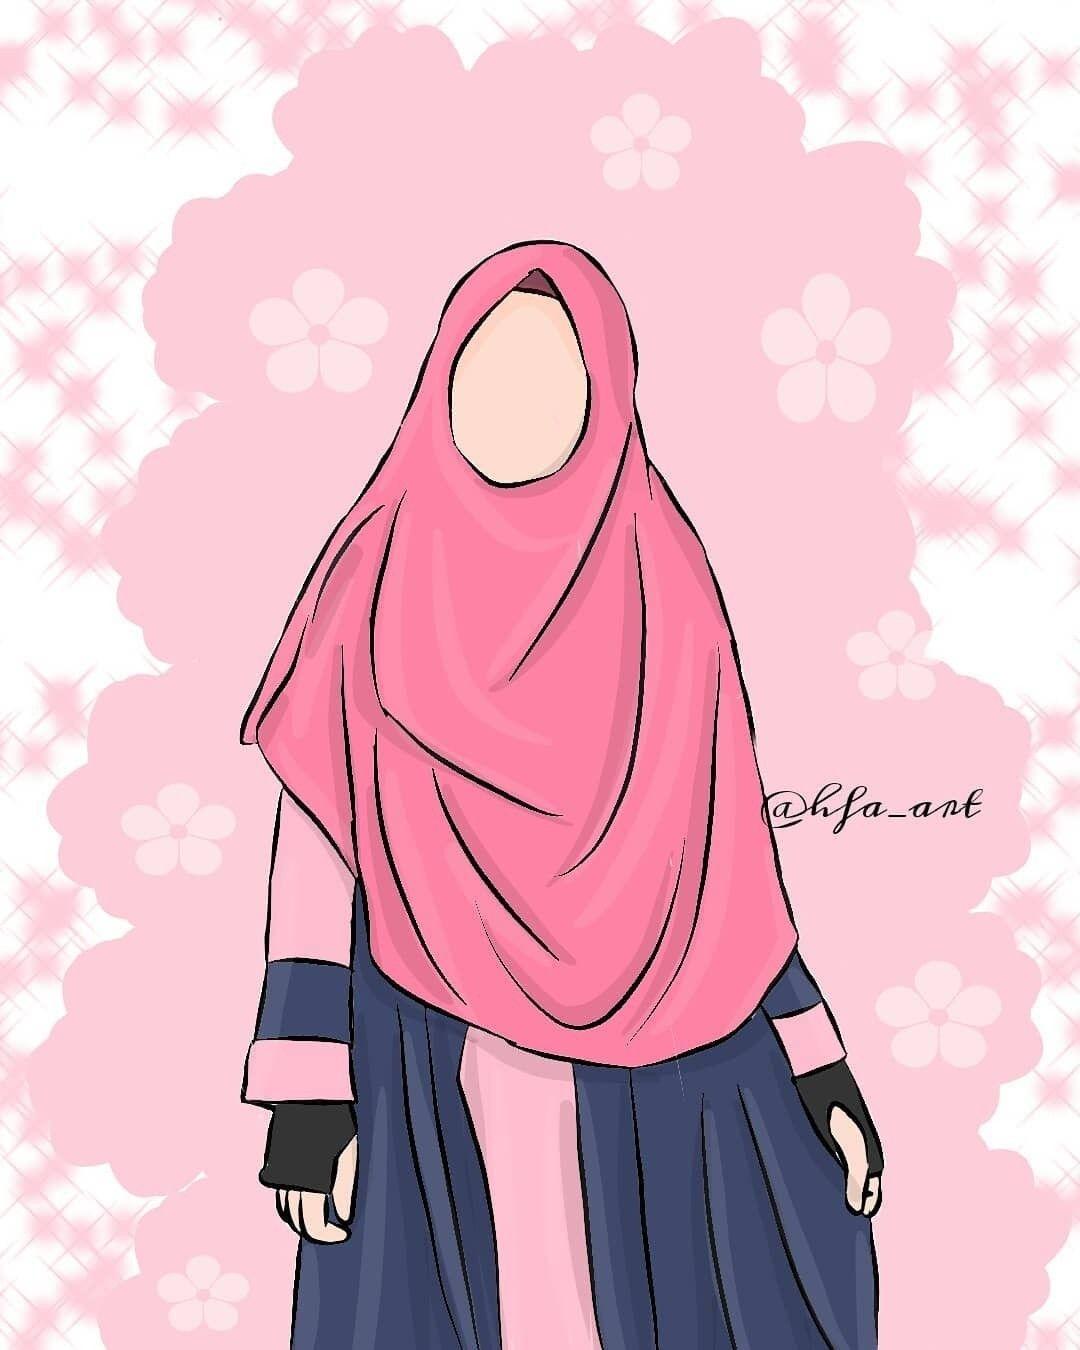 Pin Oleh Veni Jumila Danin Di Muslim Art Animasi Kartun Muslim